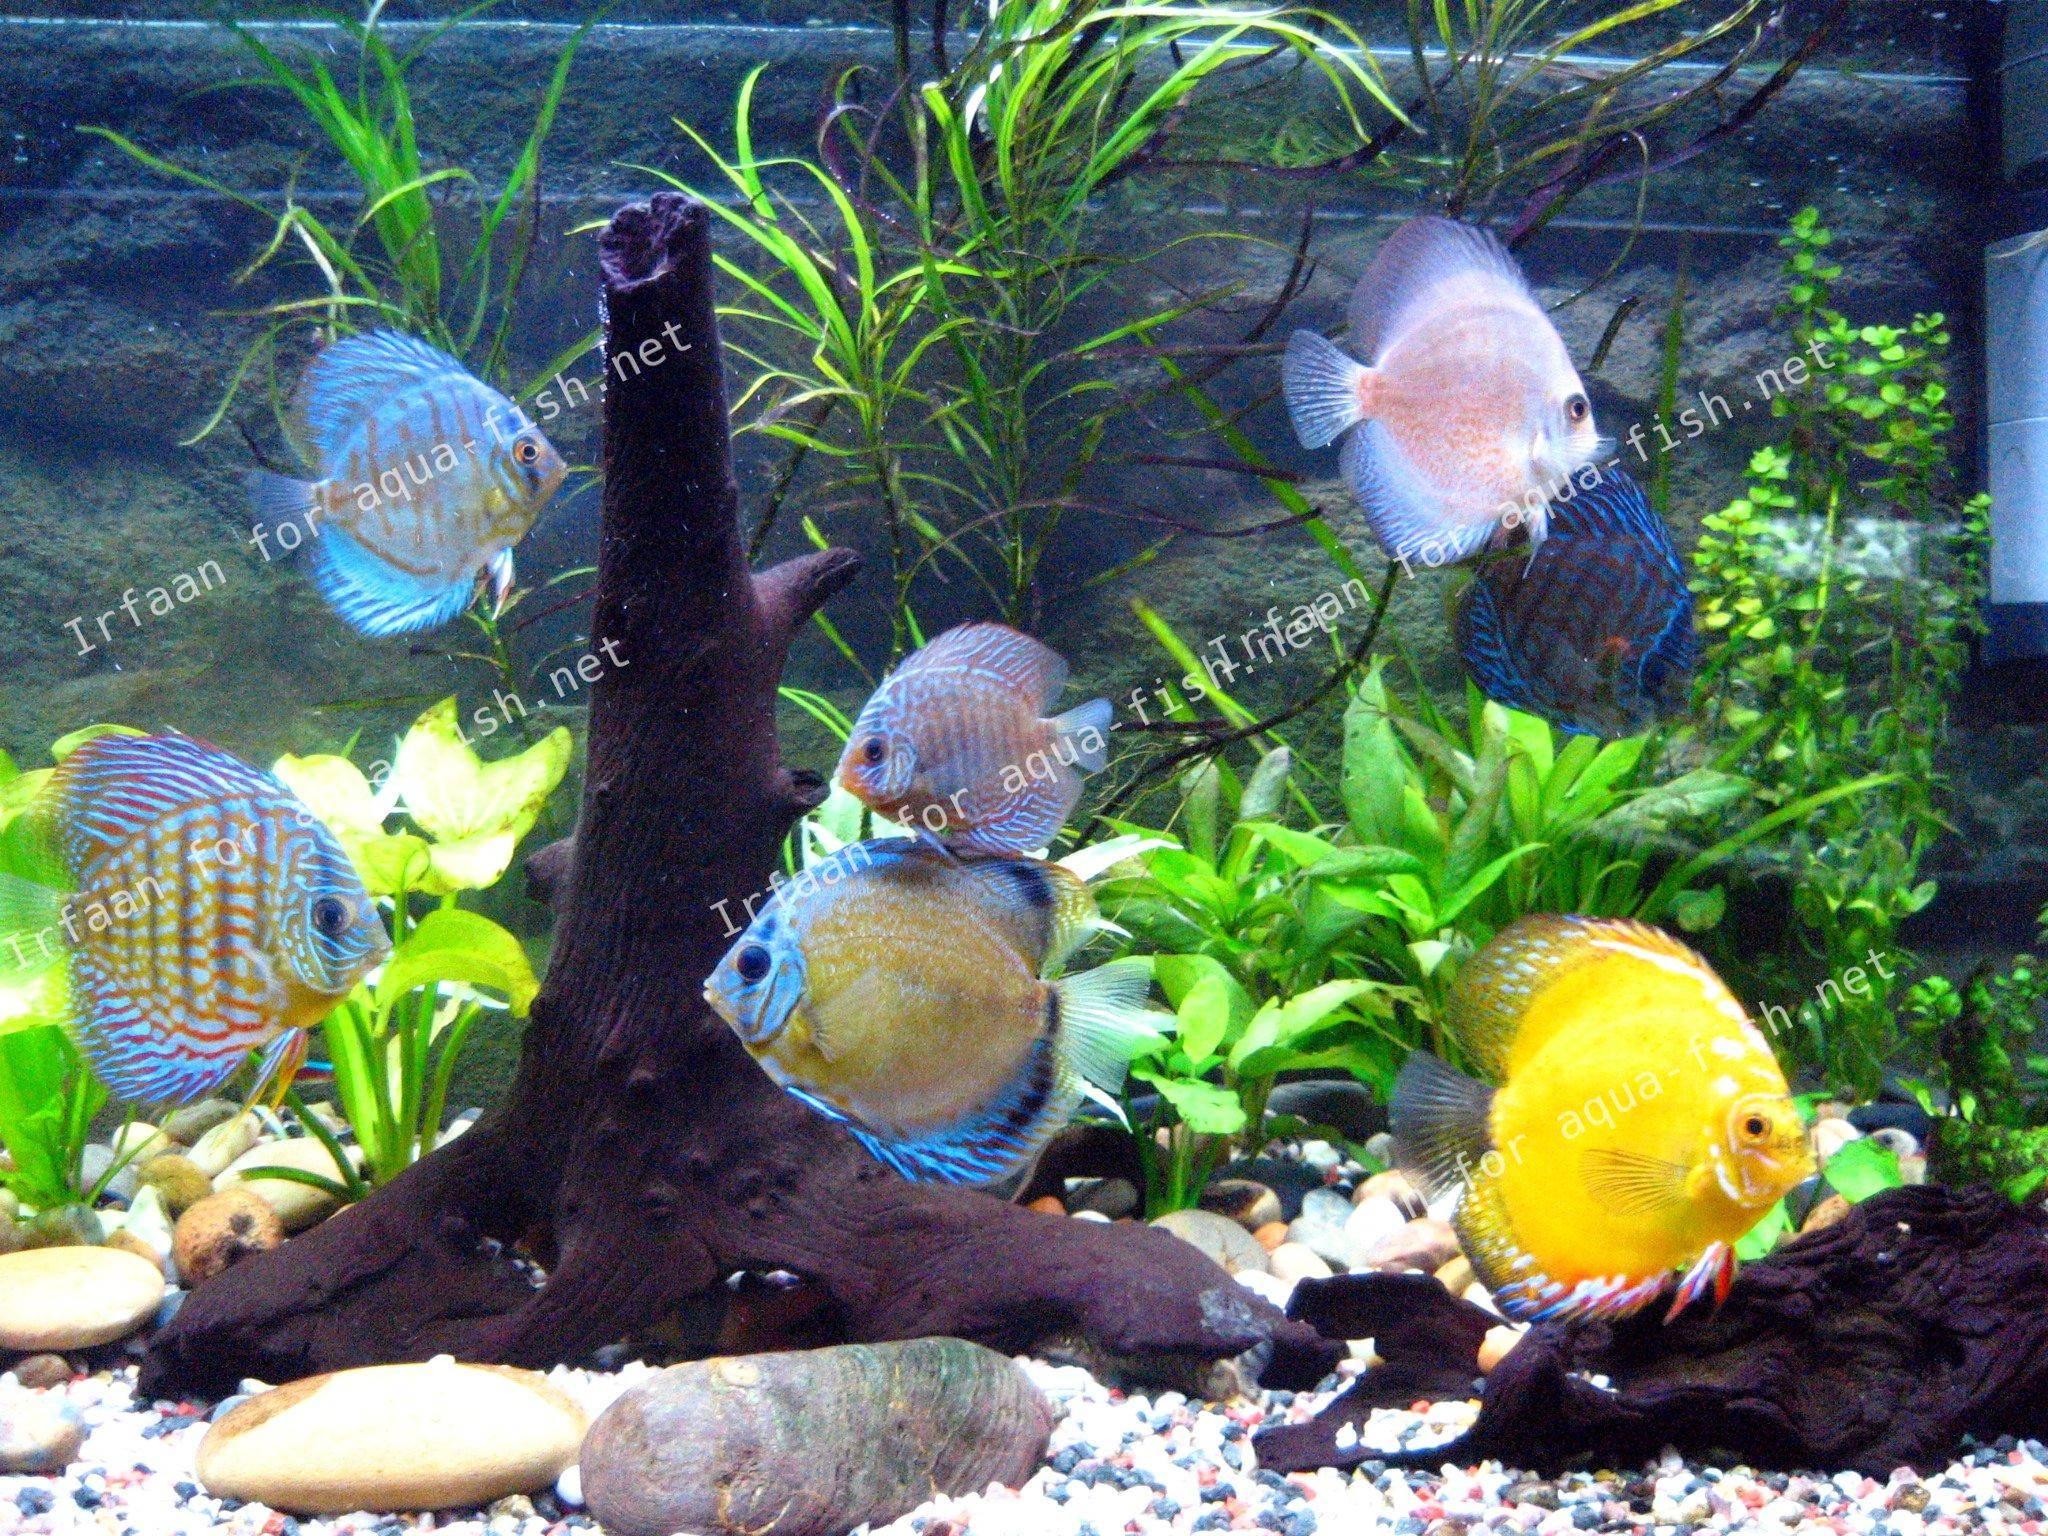 fish aquarium pets animals tropical fresh funny lol meme Car Pictures